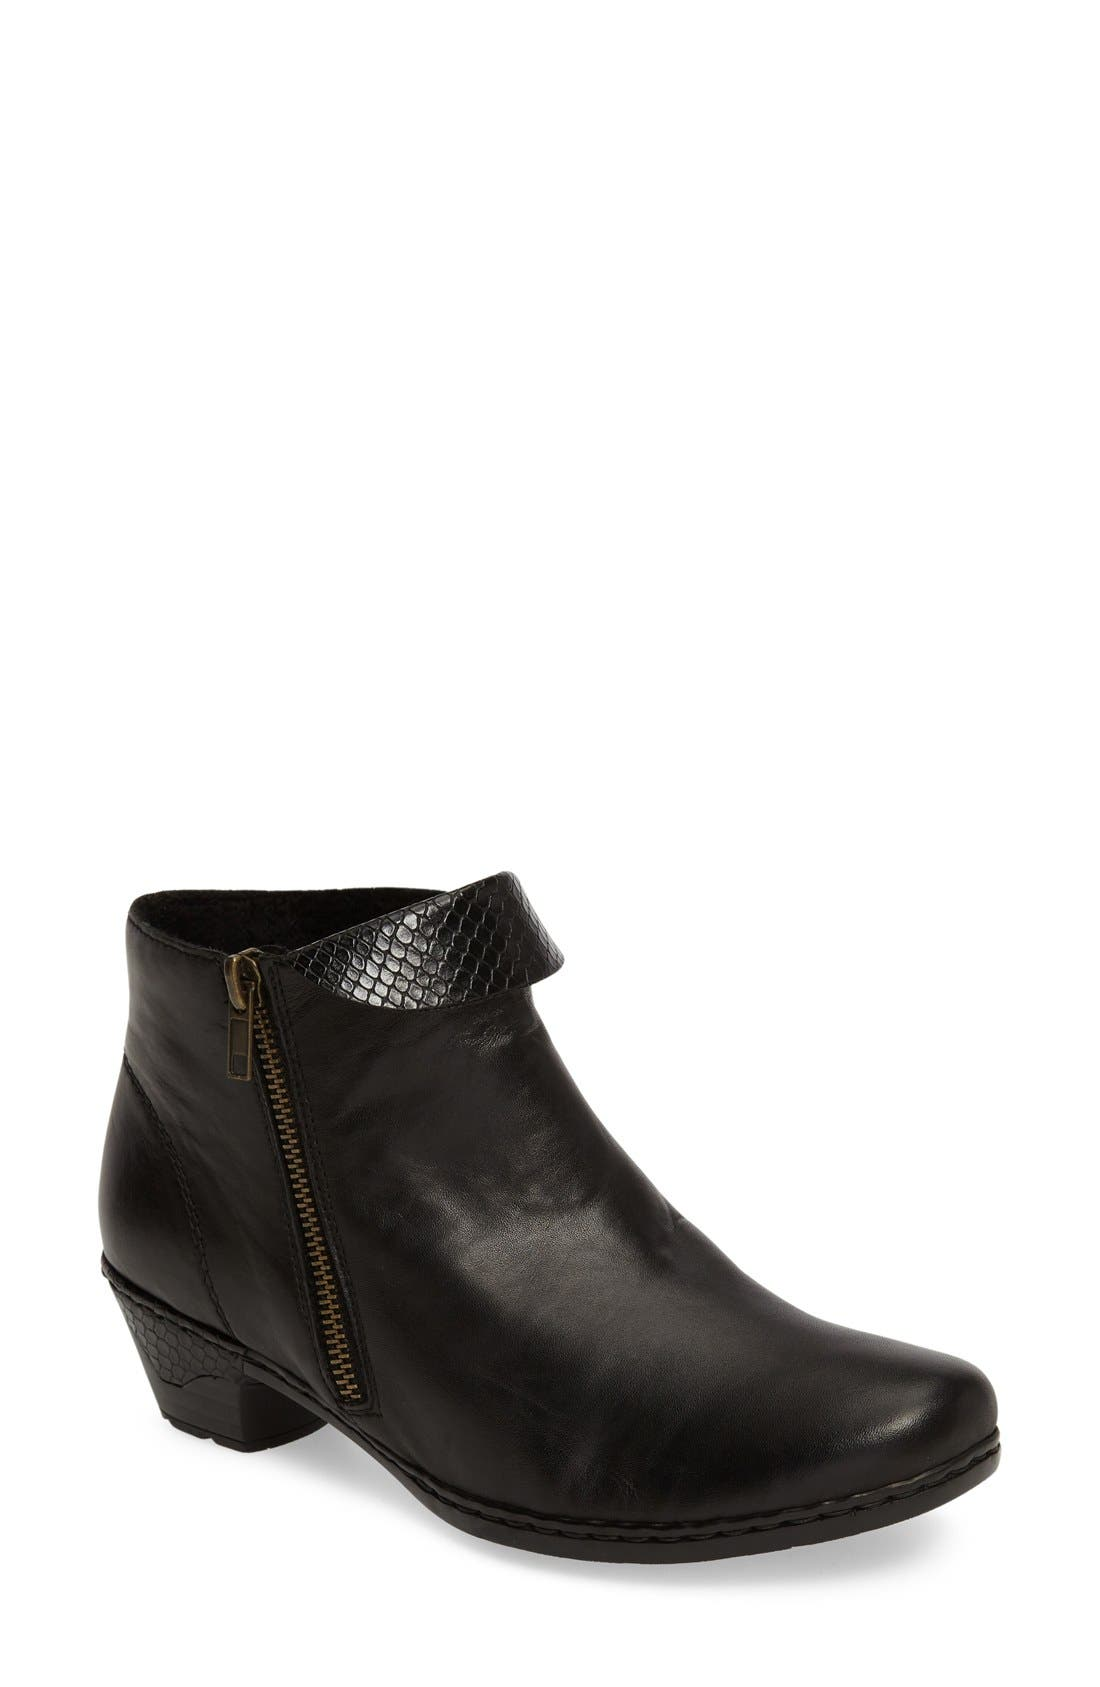 Lynn 61 Bootie,                         Main,                         color, Black/ Black Leather